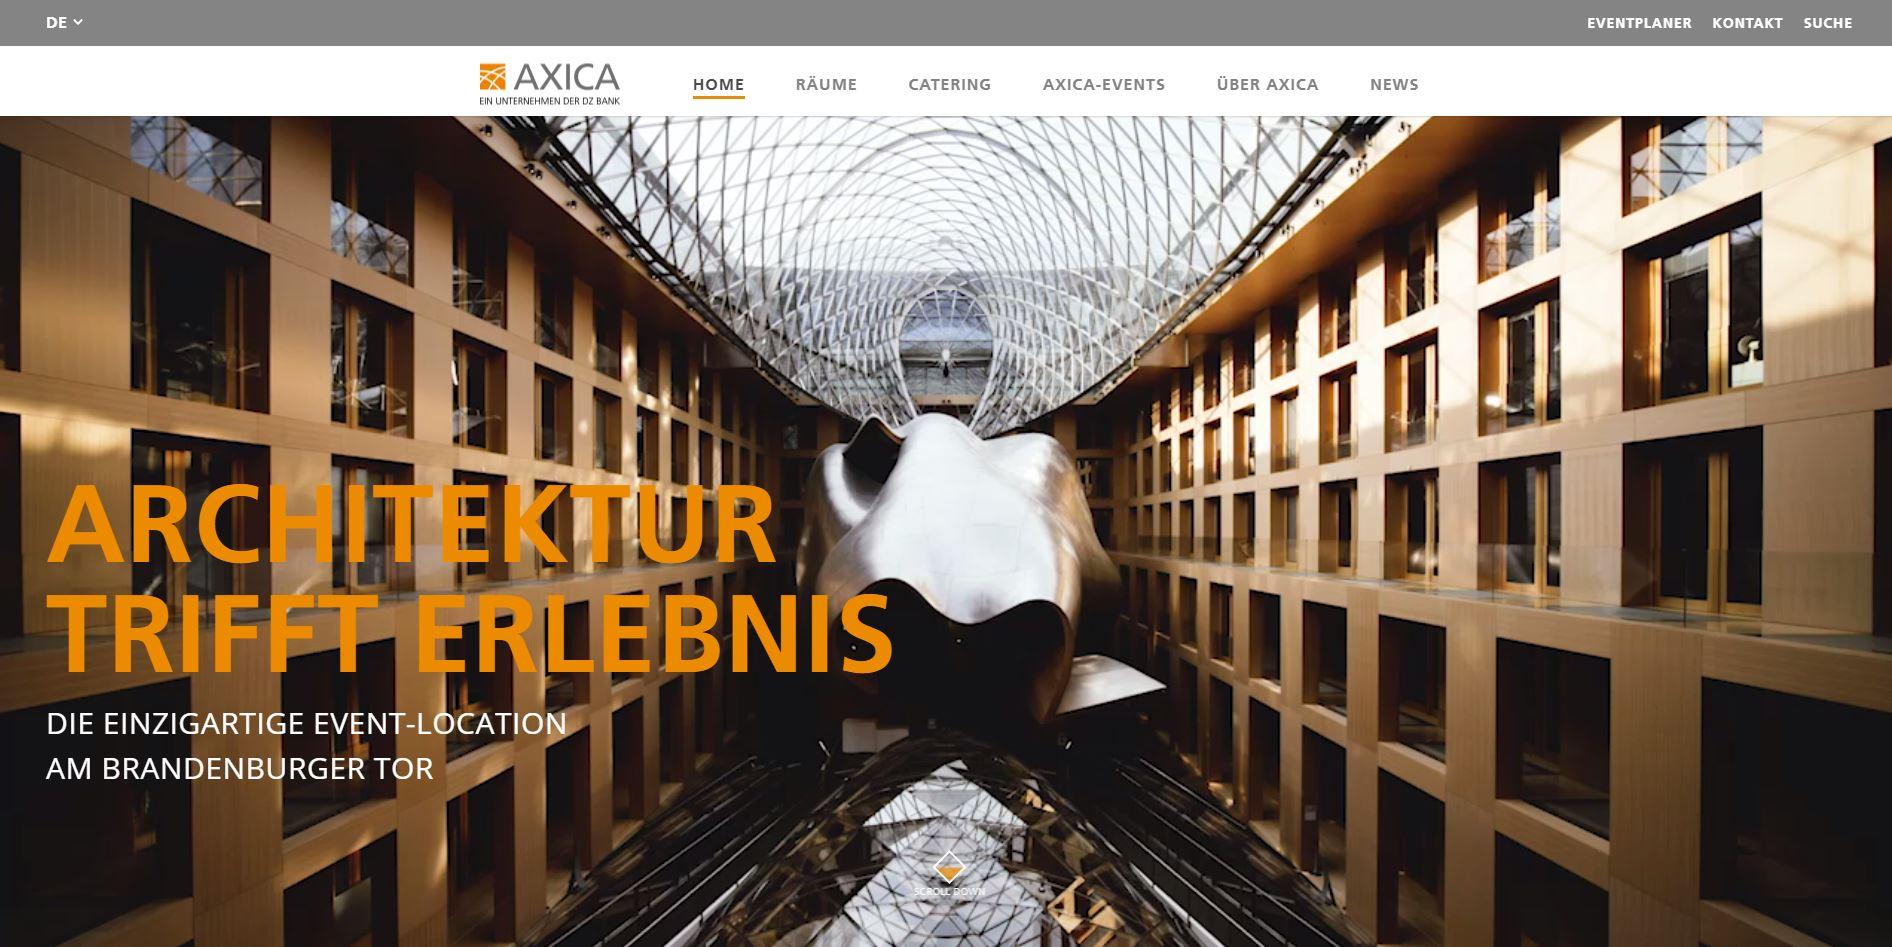 AXICA Startseite JPG